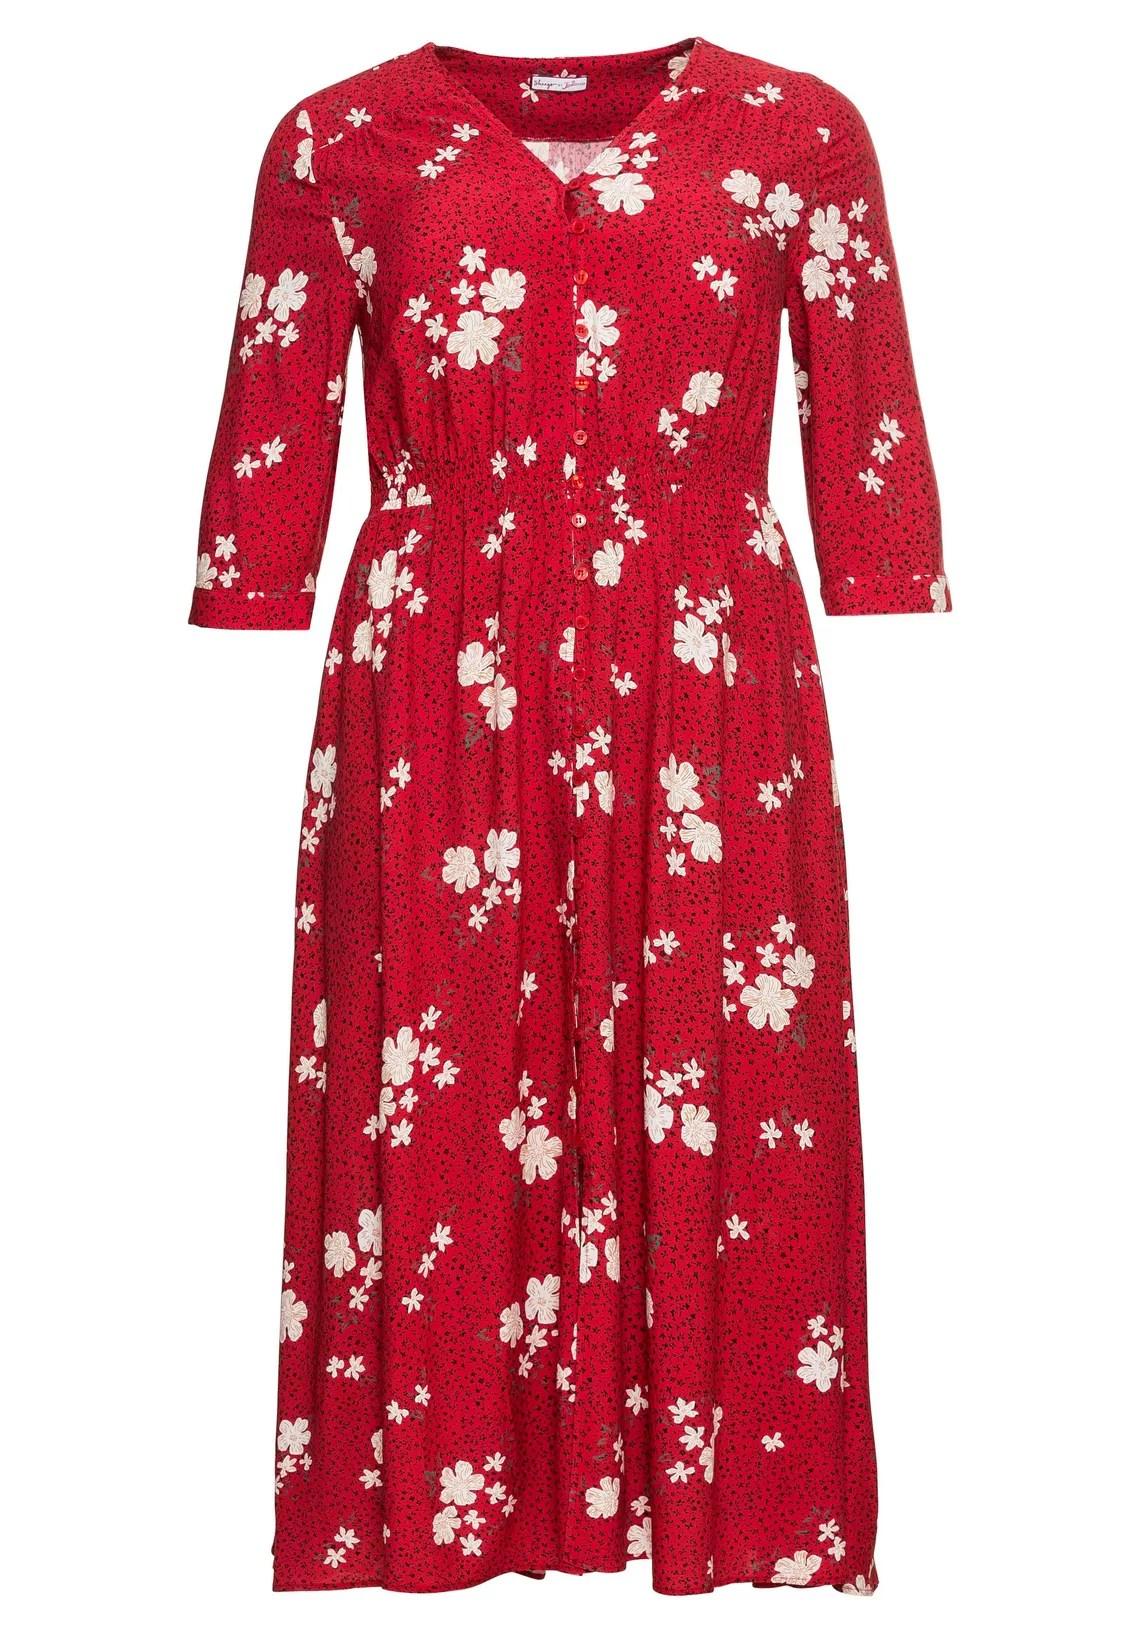 sheego by Joe Browns maxi-jurk met kleurrijke bloemenprint